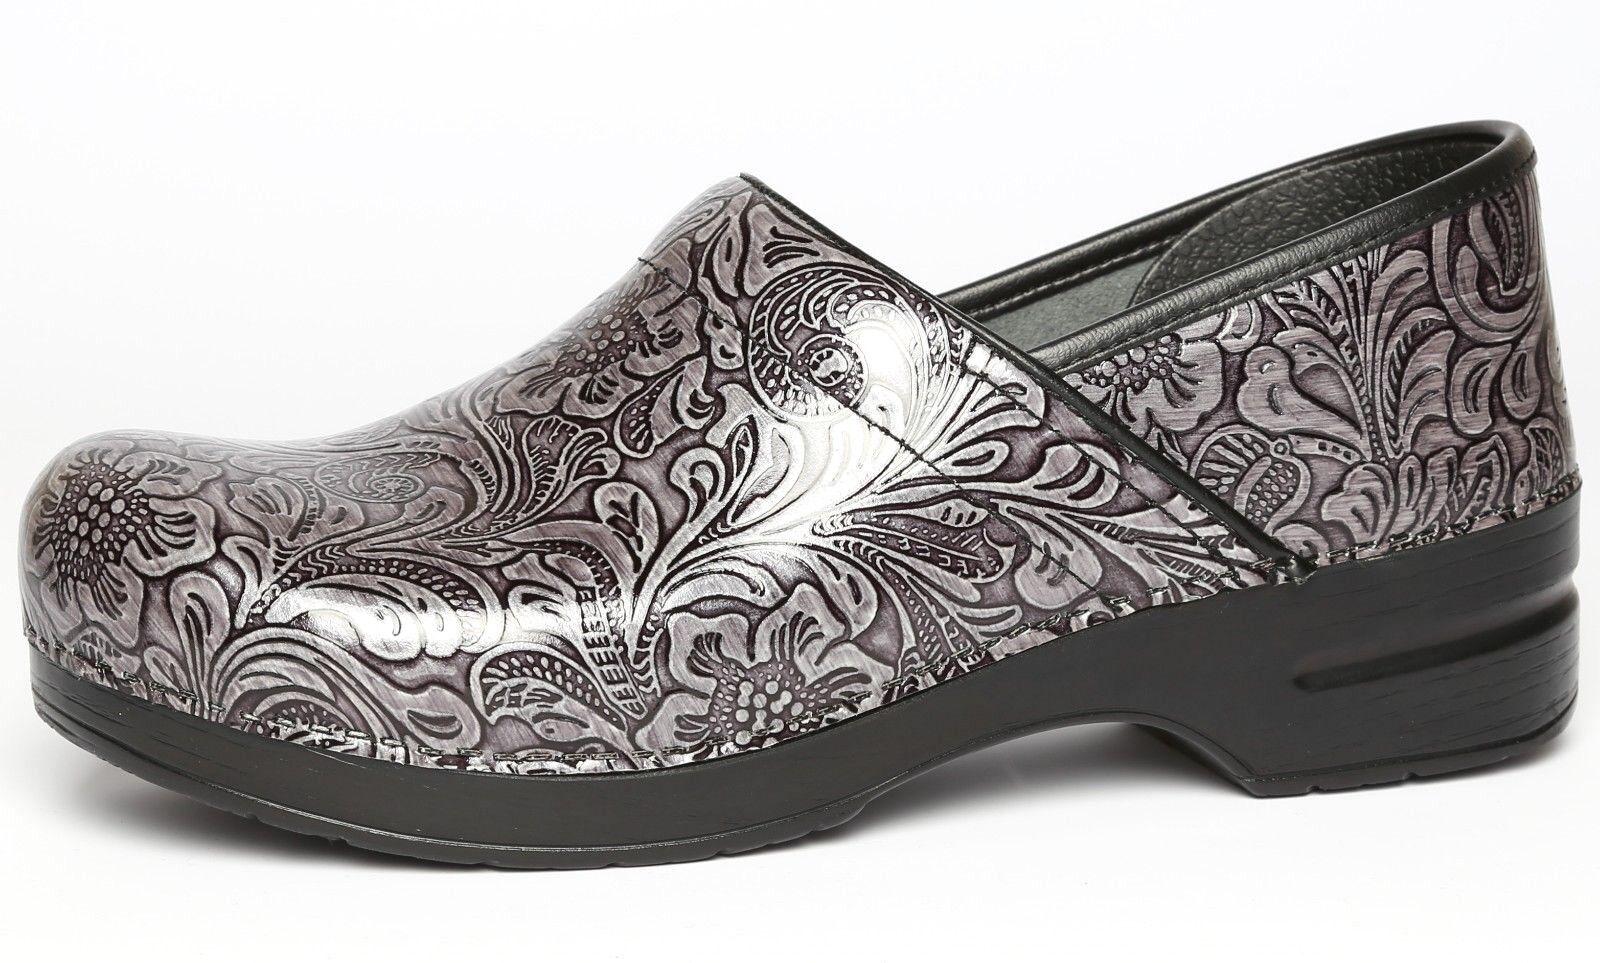 Dansko Womens Professional Grey Tooled Patent Leather Clog Sz 42 EUR 1003